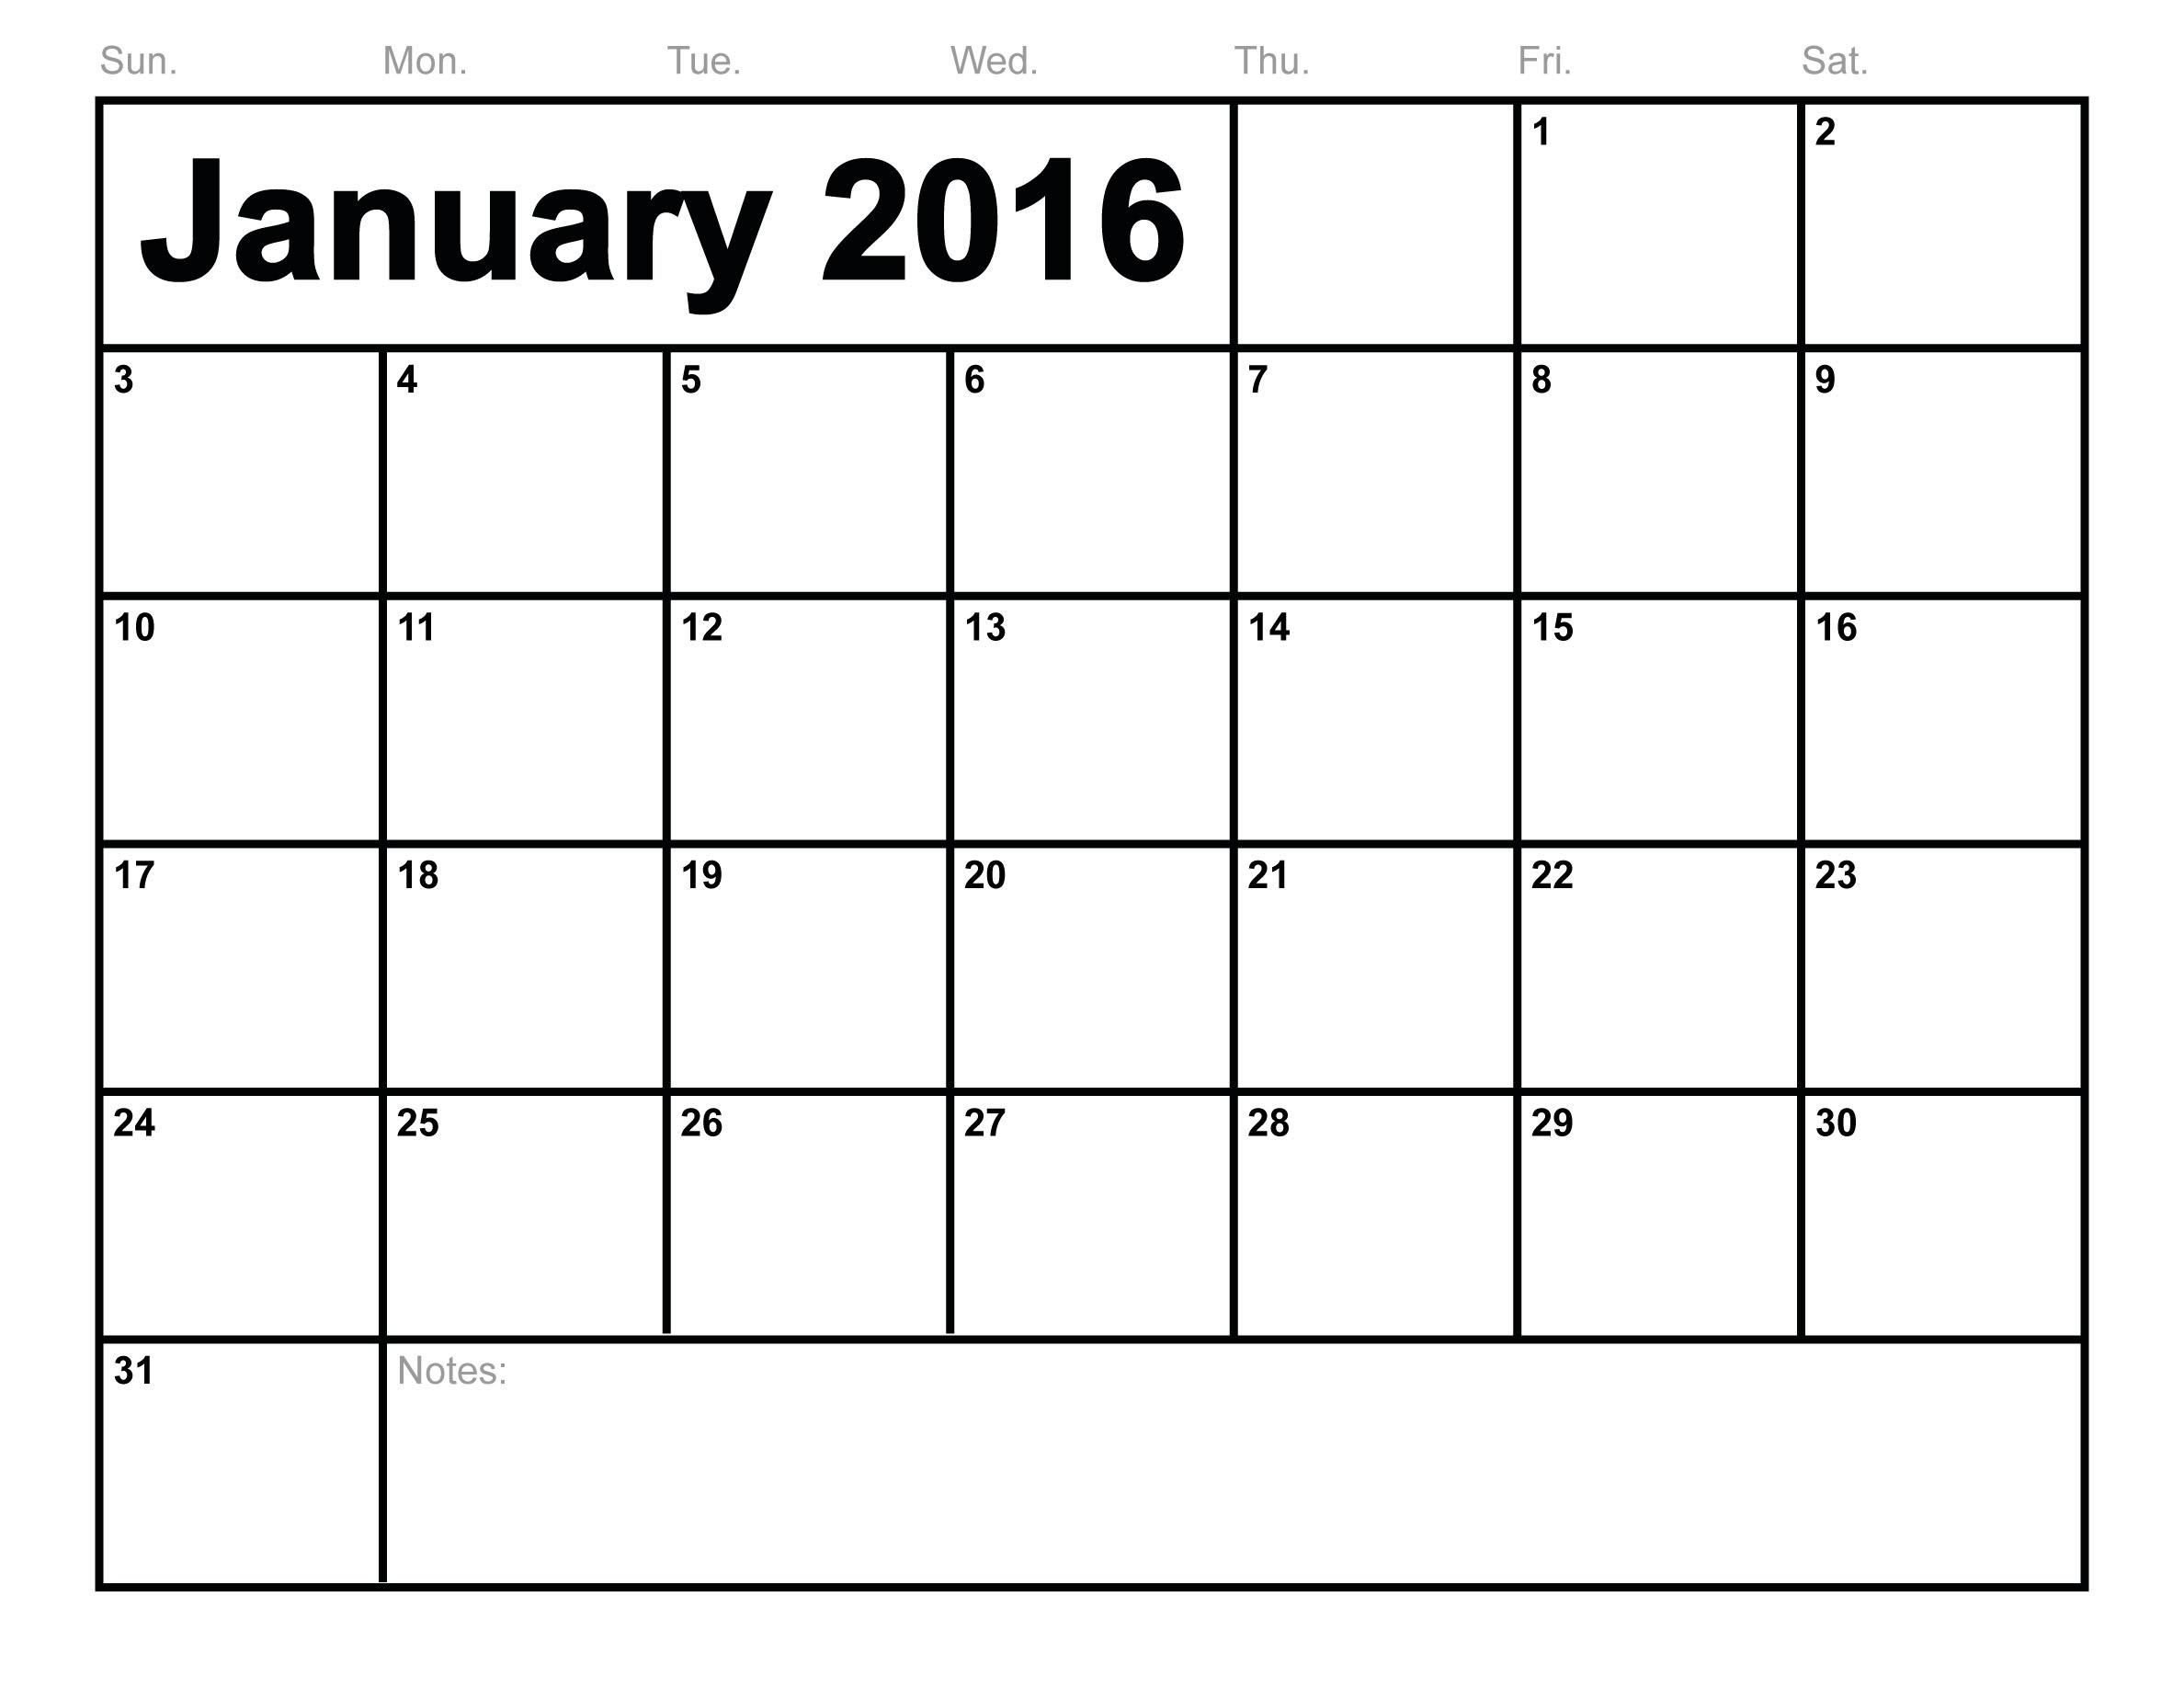 january 2016 calendar printable free blank calendar 2016 2jpg 2376x1836